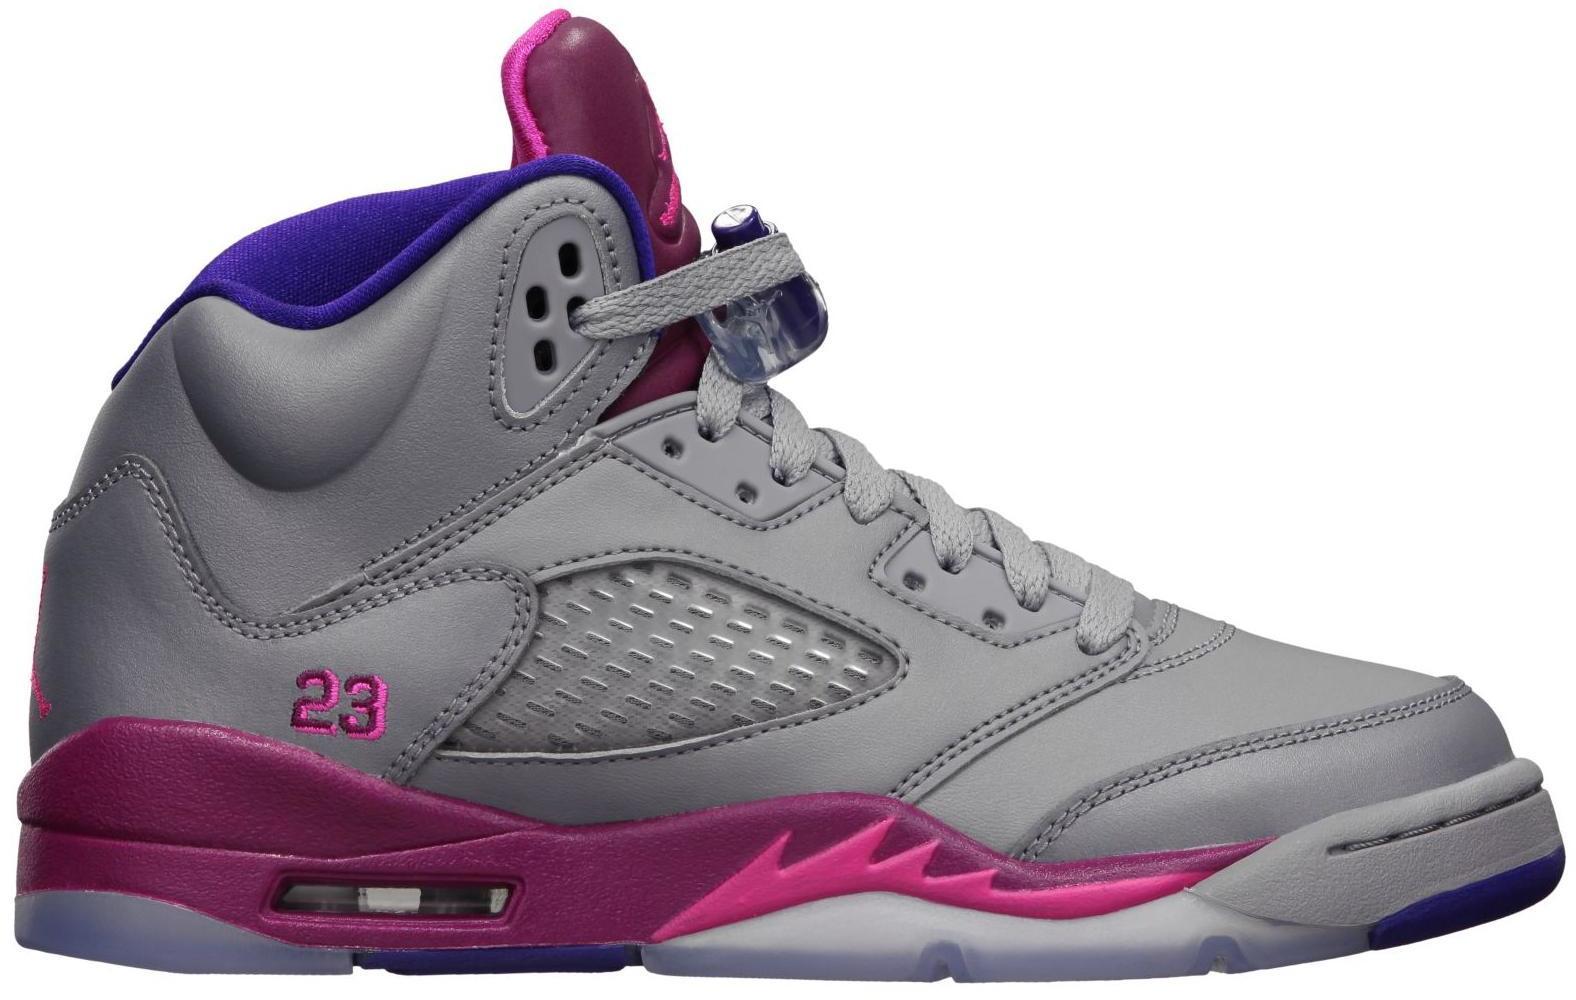 Jordan 5 Retro Cement Grey Pink (GS